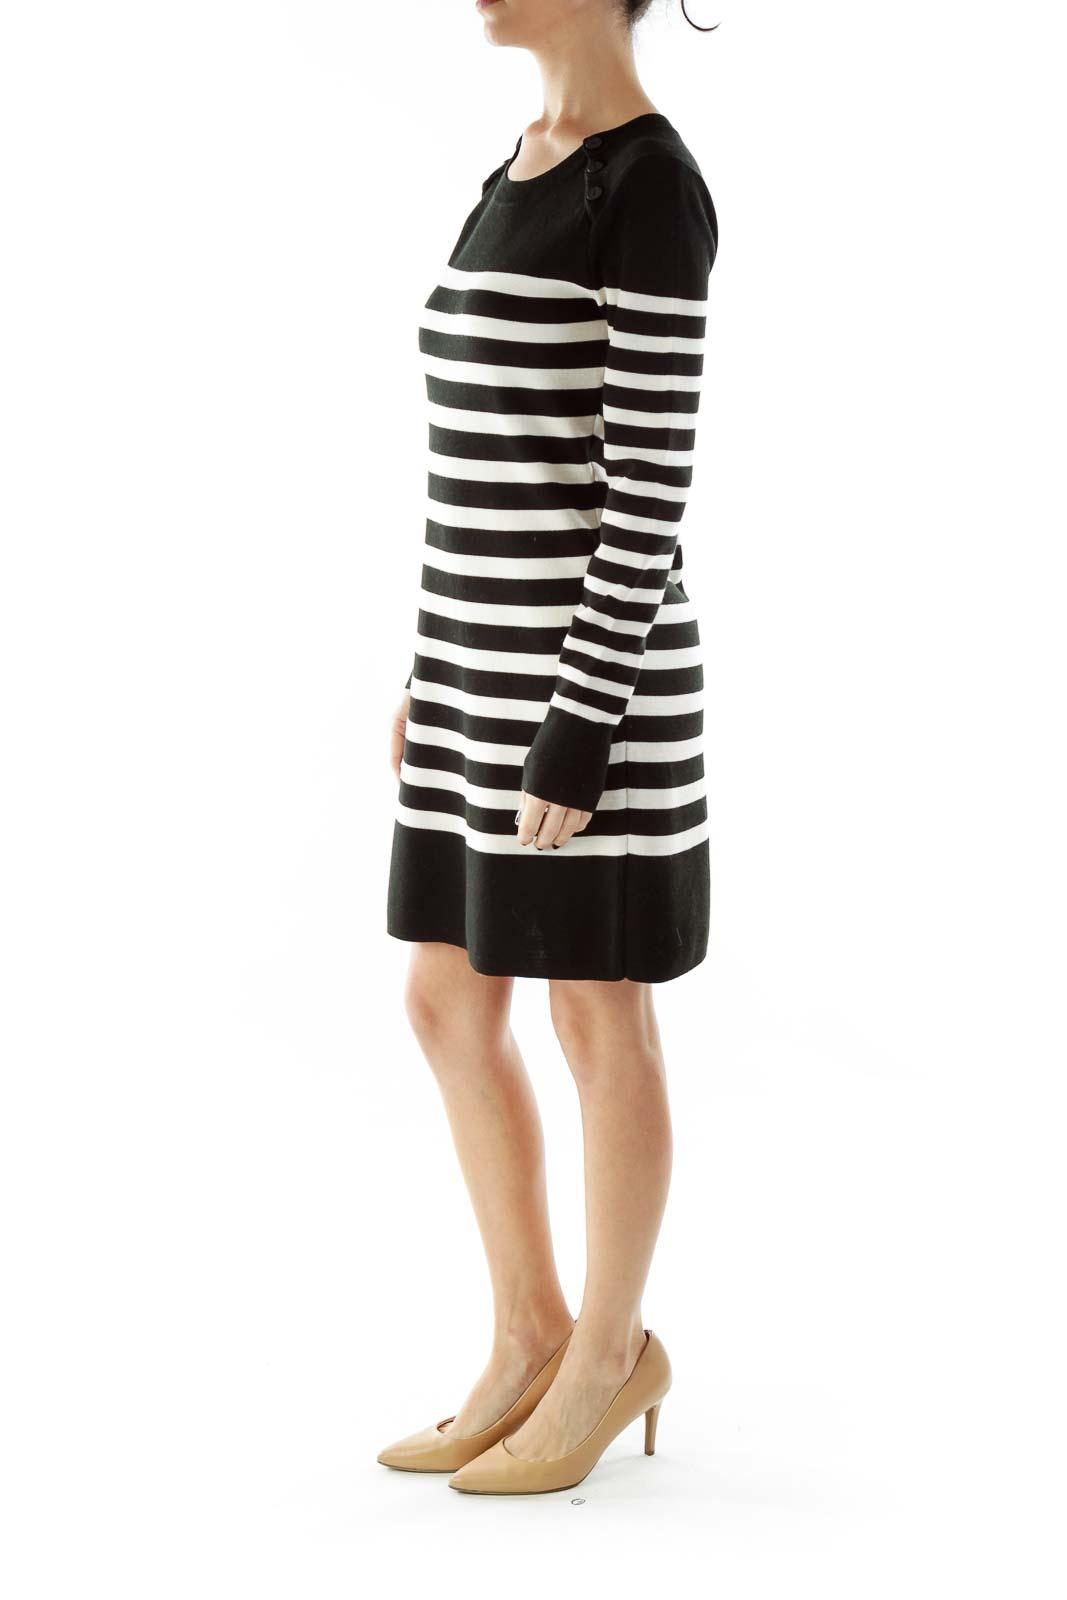 Black White Striped Buttoned Round Neck Knit Dress